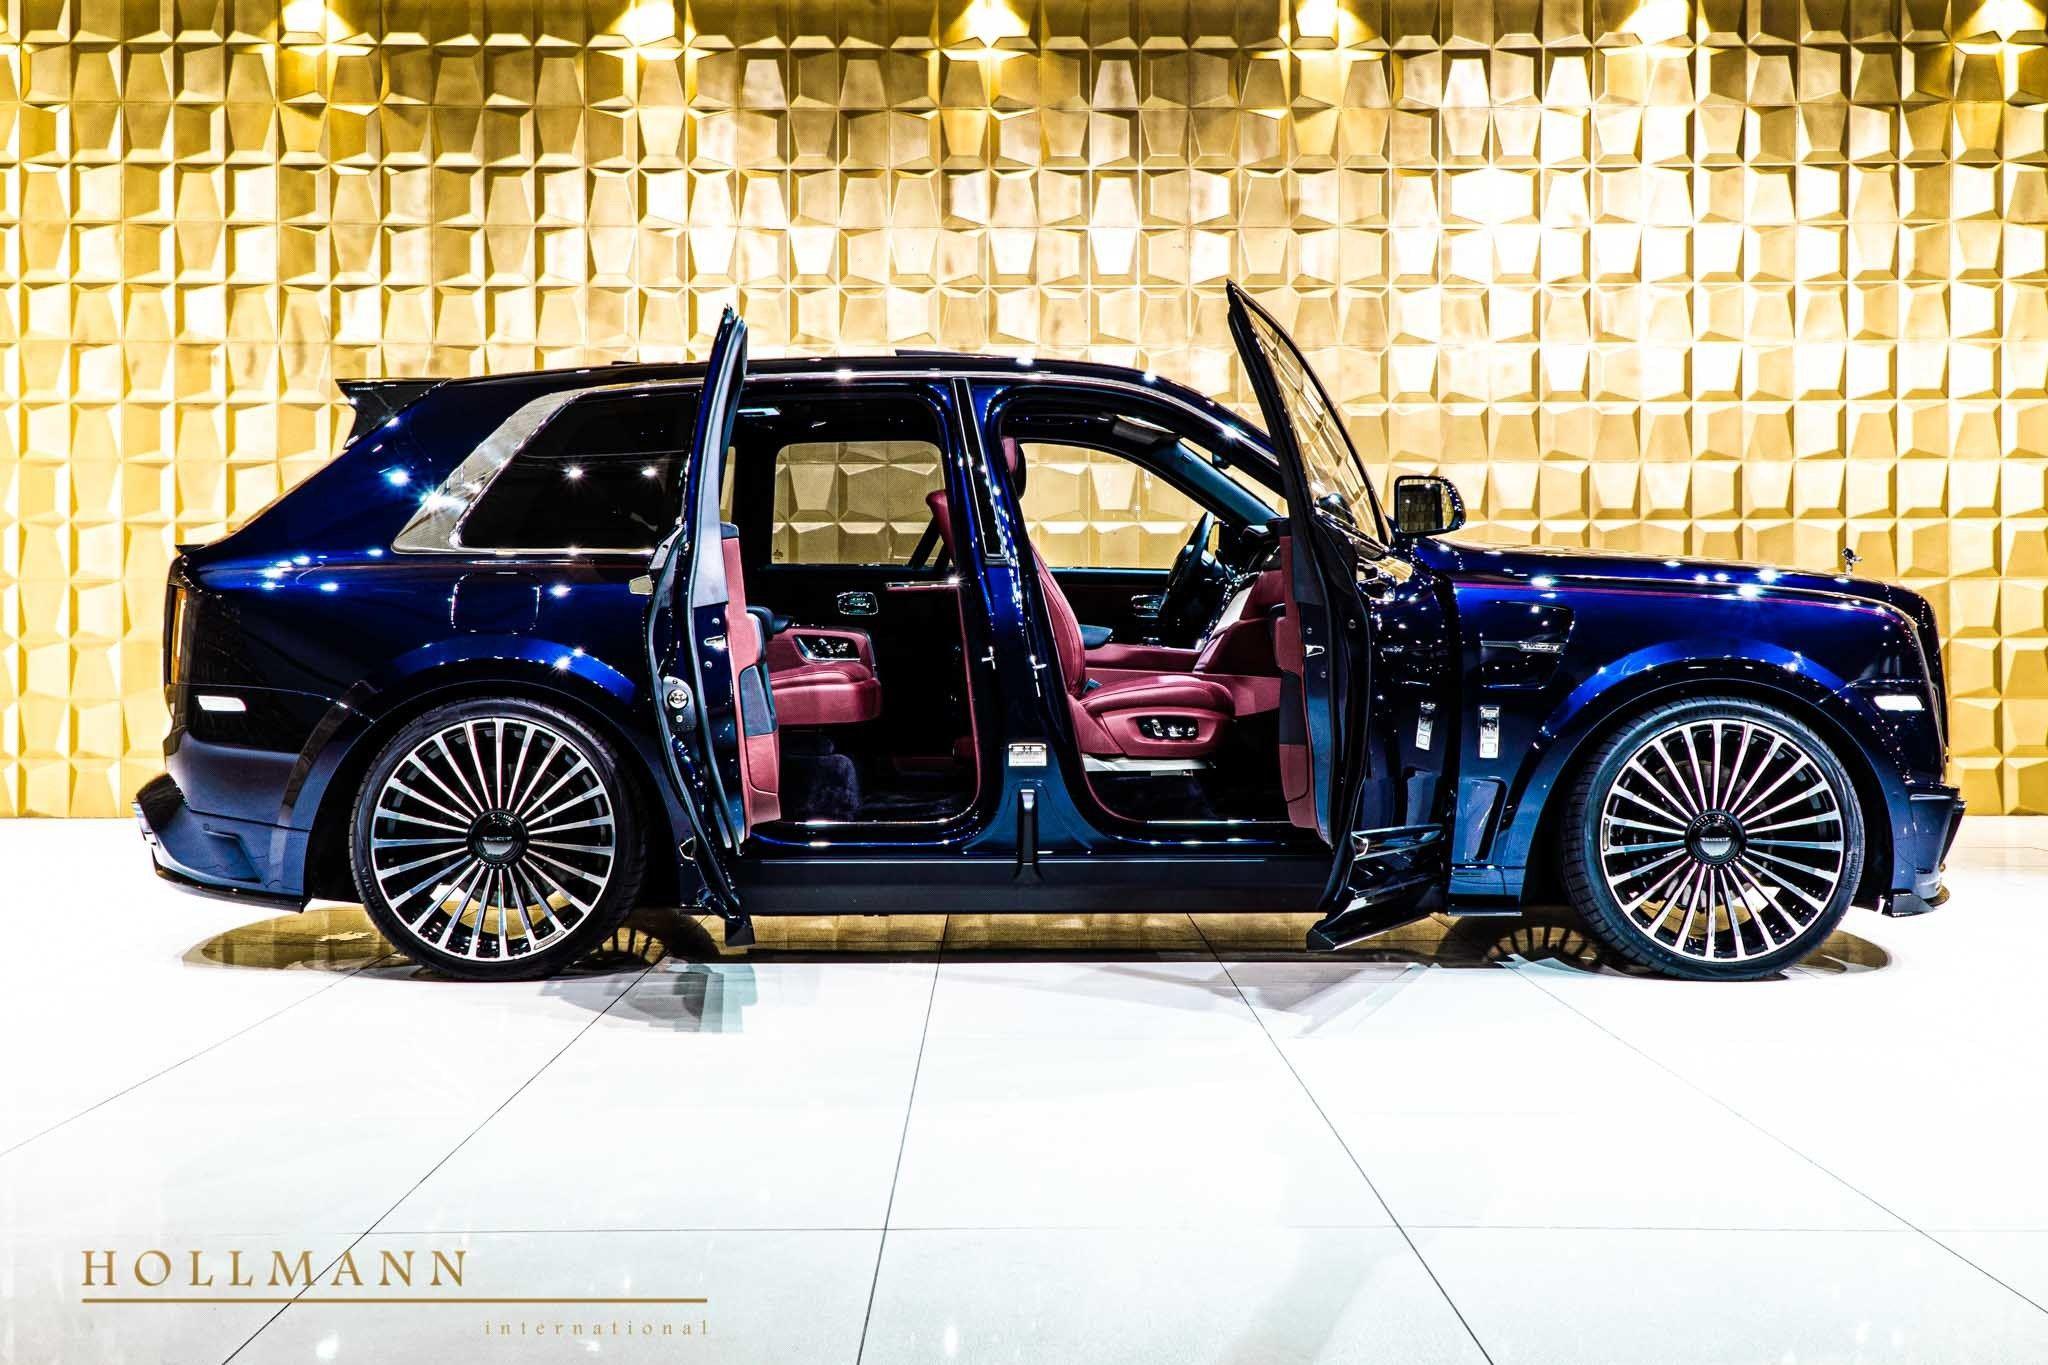 Rolls Royce Cullinan By Mansory Hollmann Luxury Pulse Cars Germany For Sale On Luxurypulse Luxury Cars Rolls Royce Rolls Royce Cullinan Rolls Royce